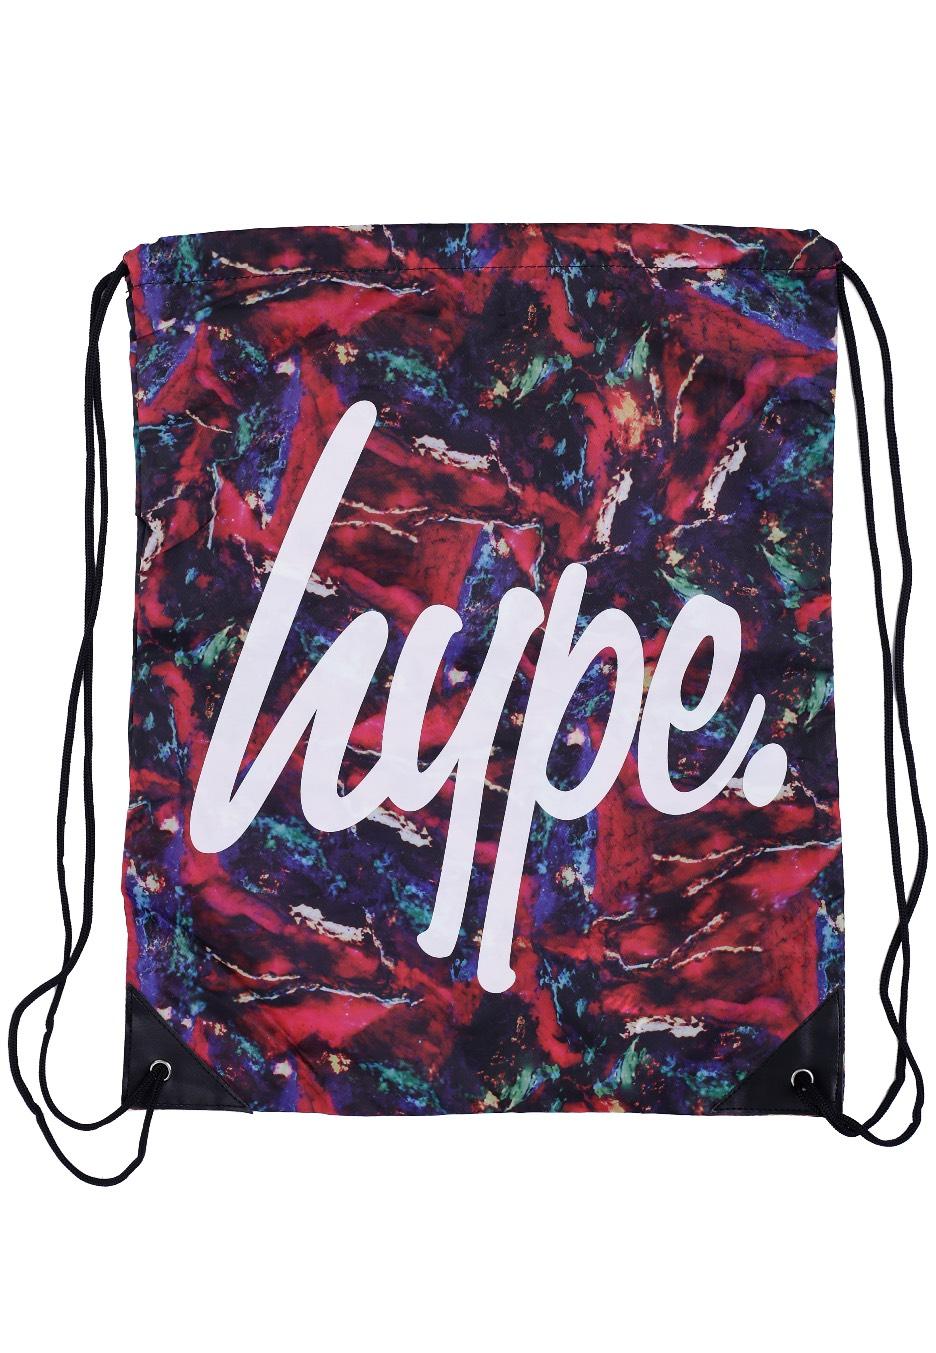 5eb2f7e4f8 HYPE. - Minerals Multi Drawstring - Backpack - Streetwear Shop ...